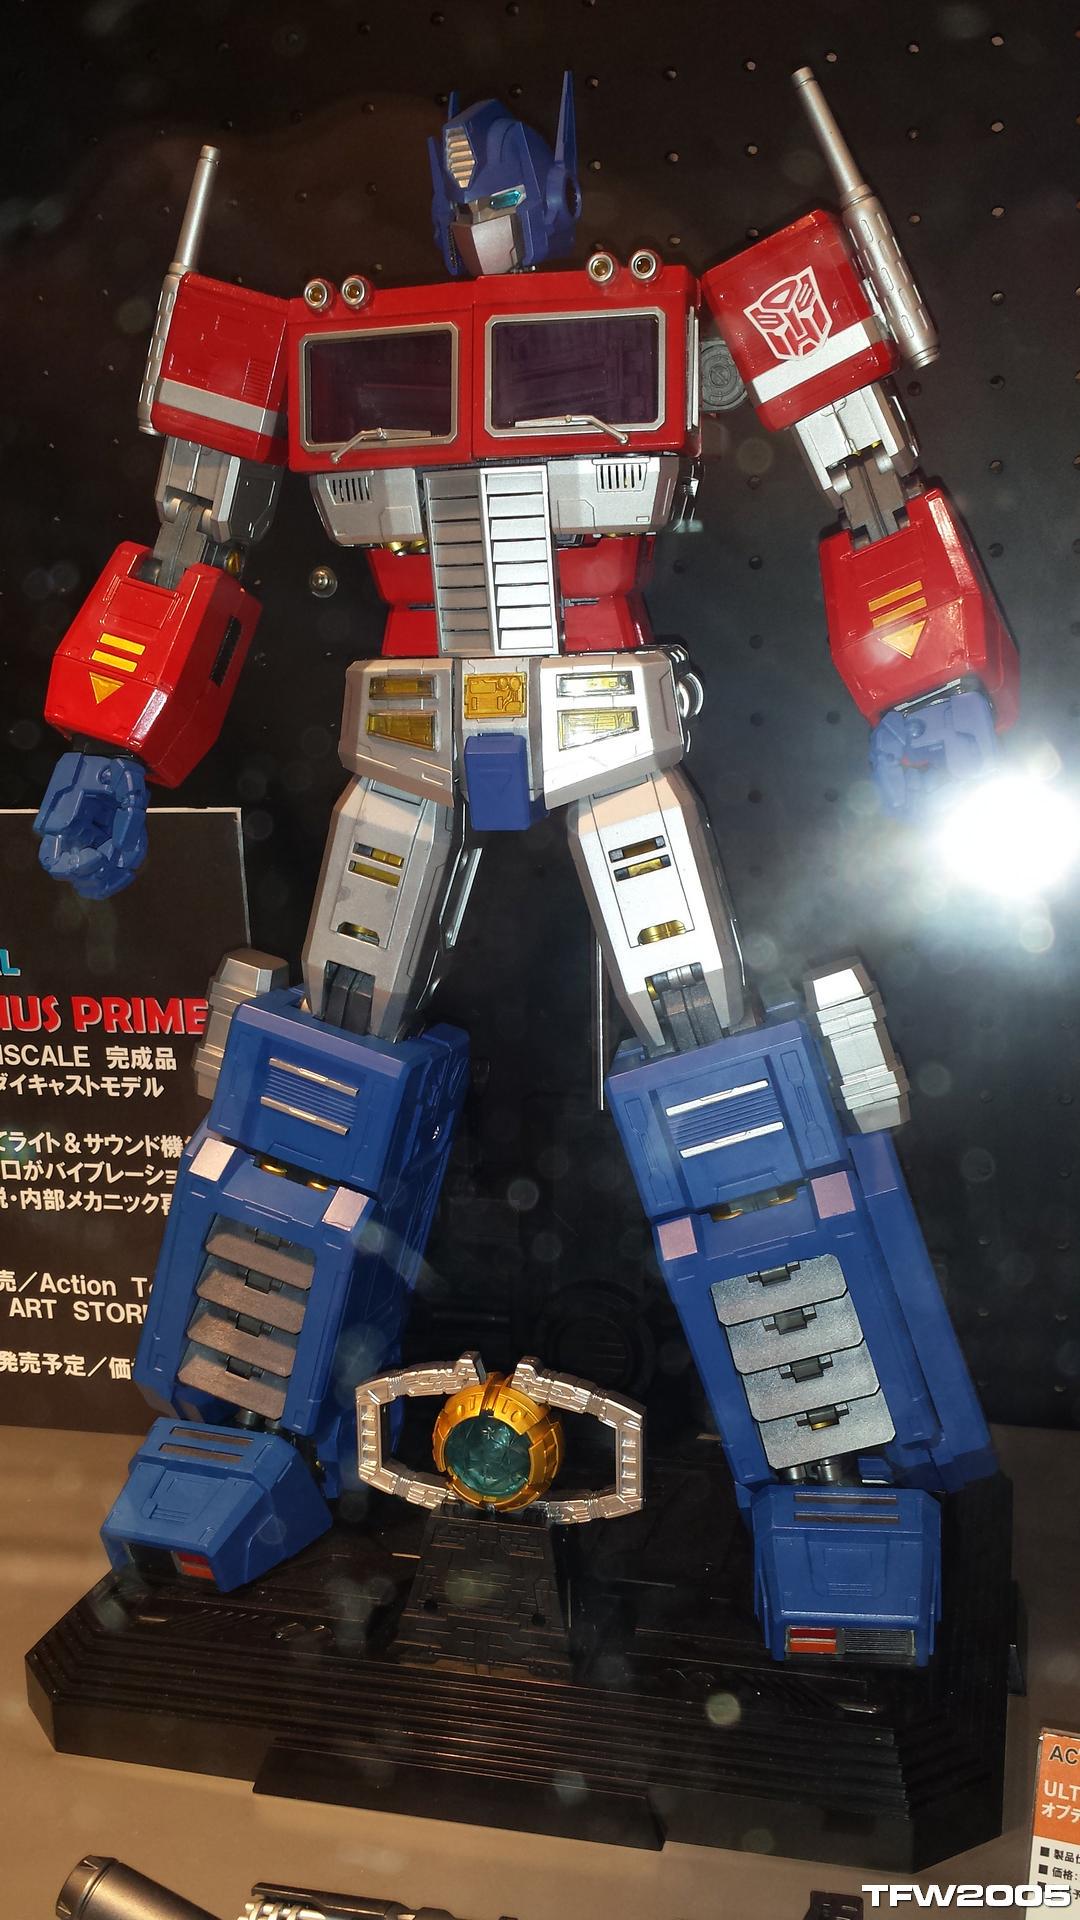 Figurines Transformers G1 (articulé, non transformable) ― Par 3A, Action Toys, Fewture, Toys Alliance, Sentinel, Kotobukiya, Kids Logic, Herocross, EX Gokin, etc Wonderfest-002_1375021507